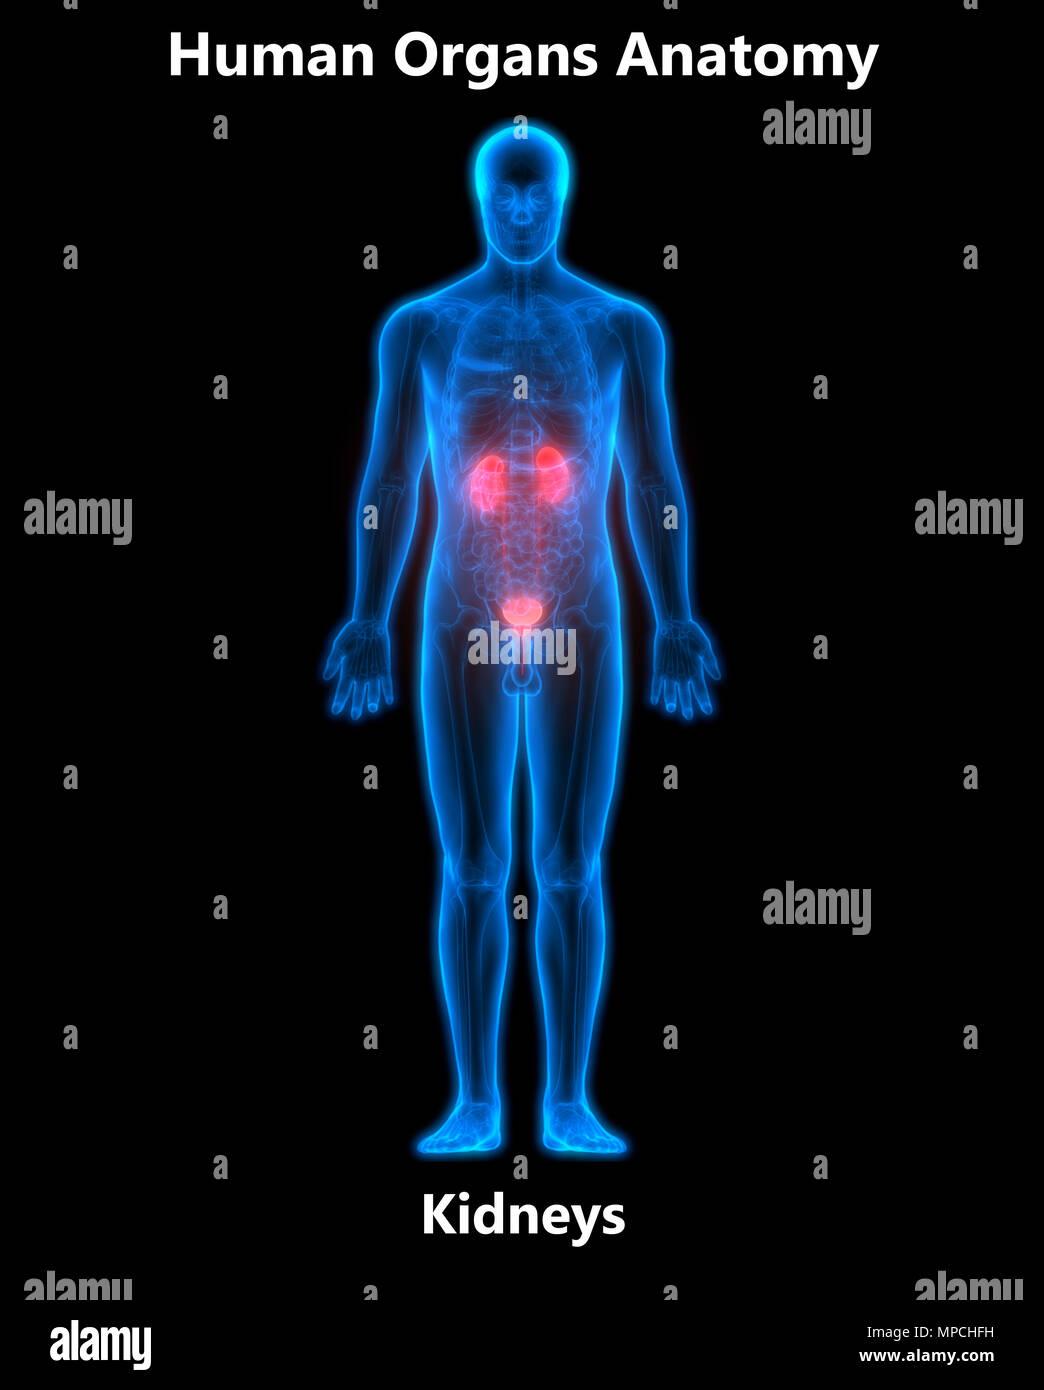 Human Urinary System Kidneys With Gallbladder Anatomy Stock Photo